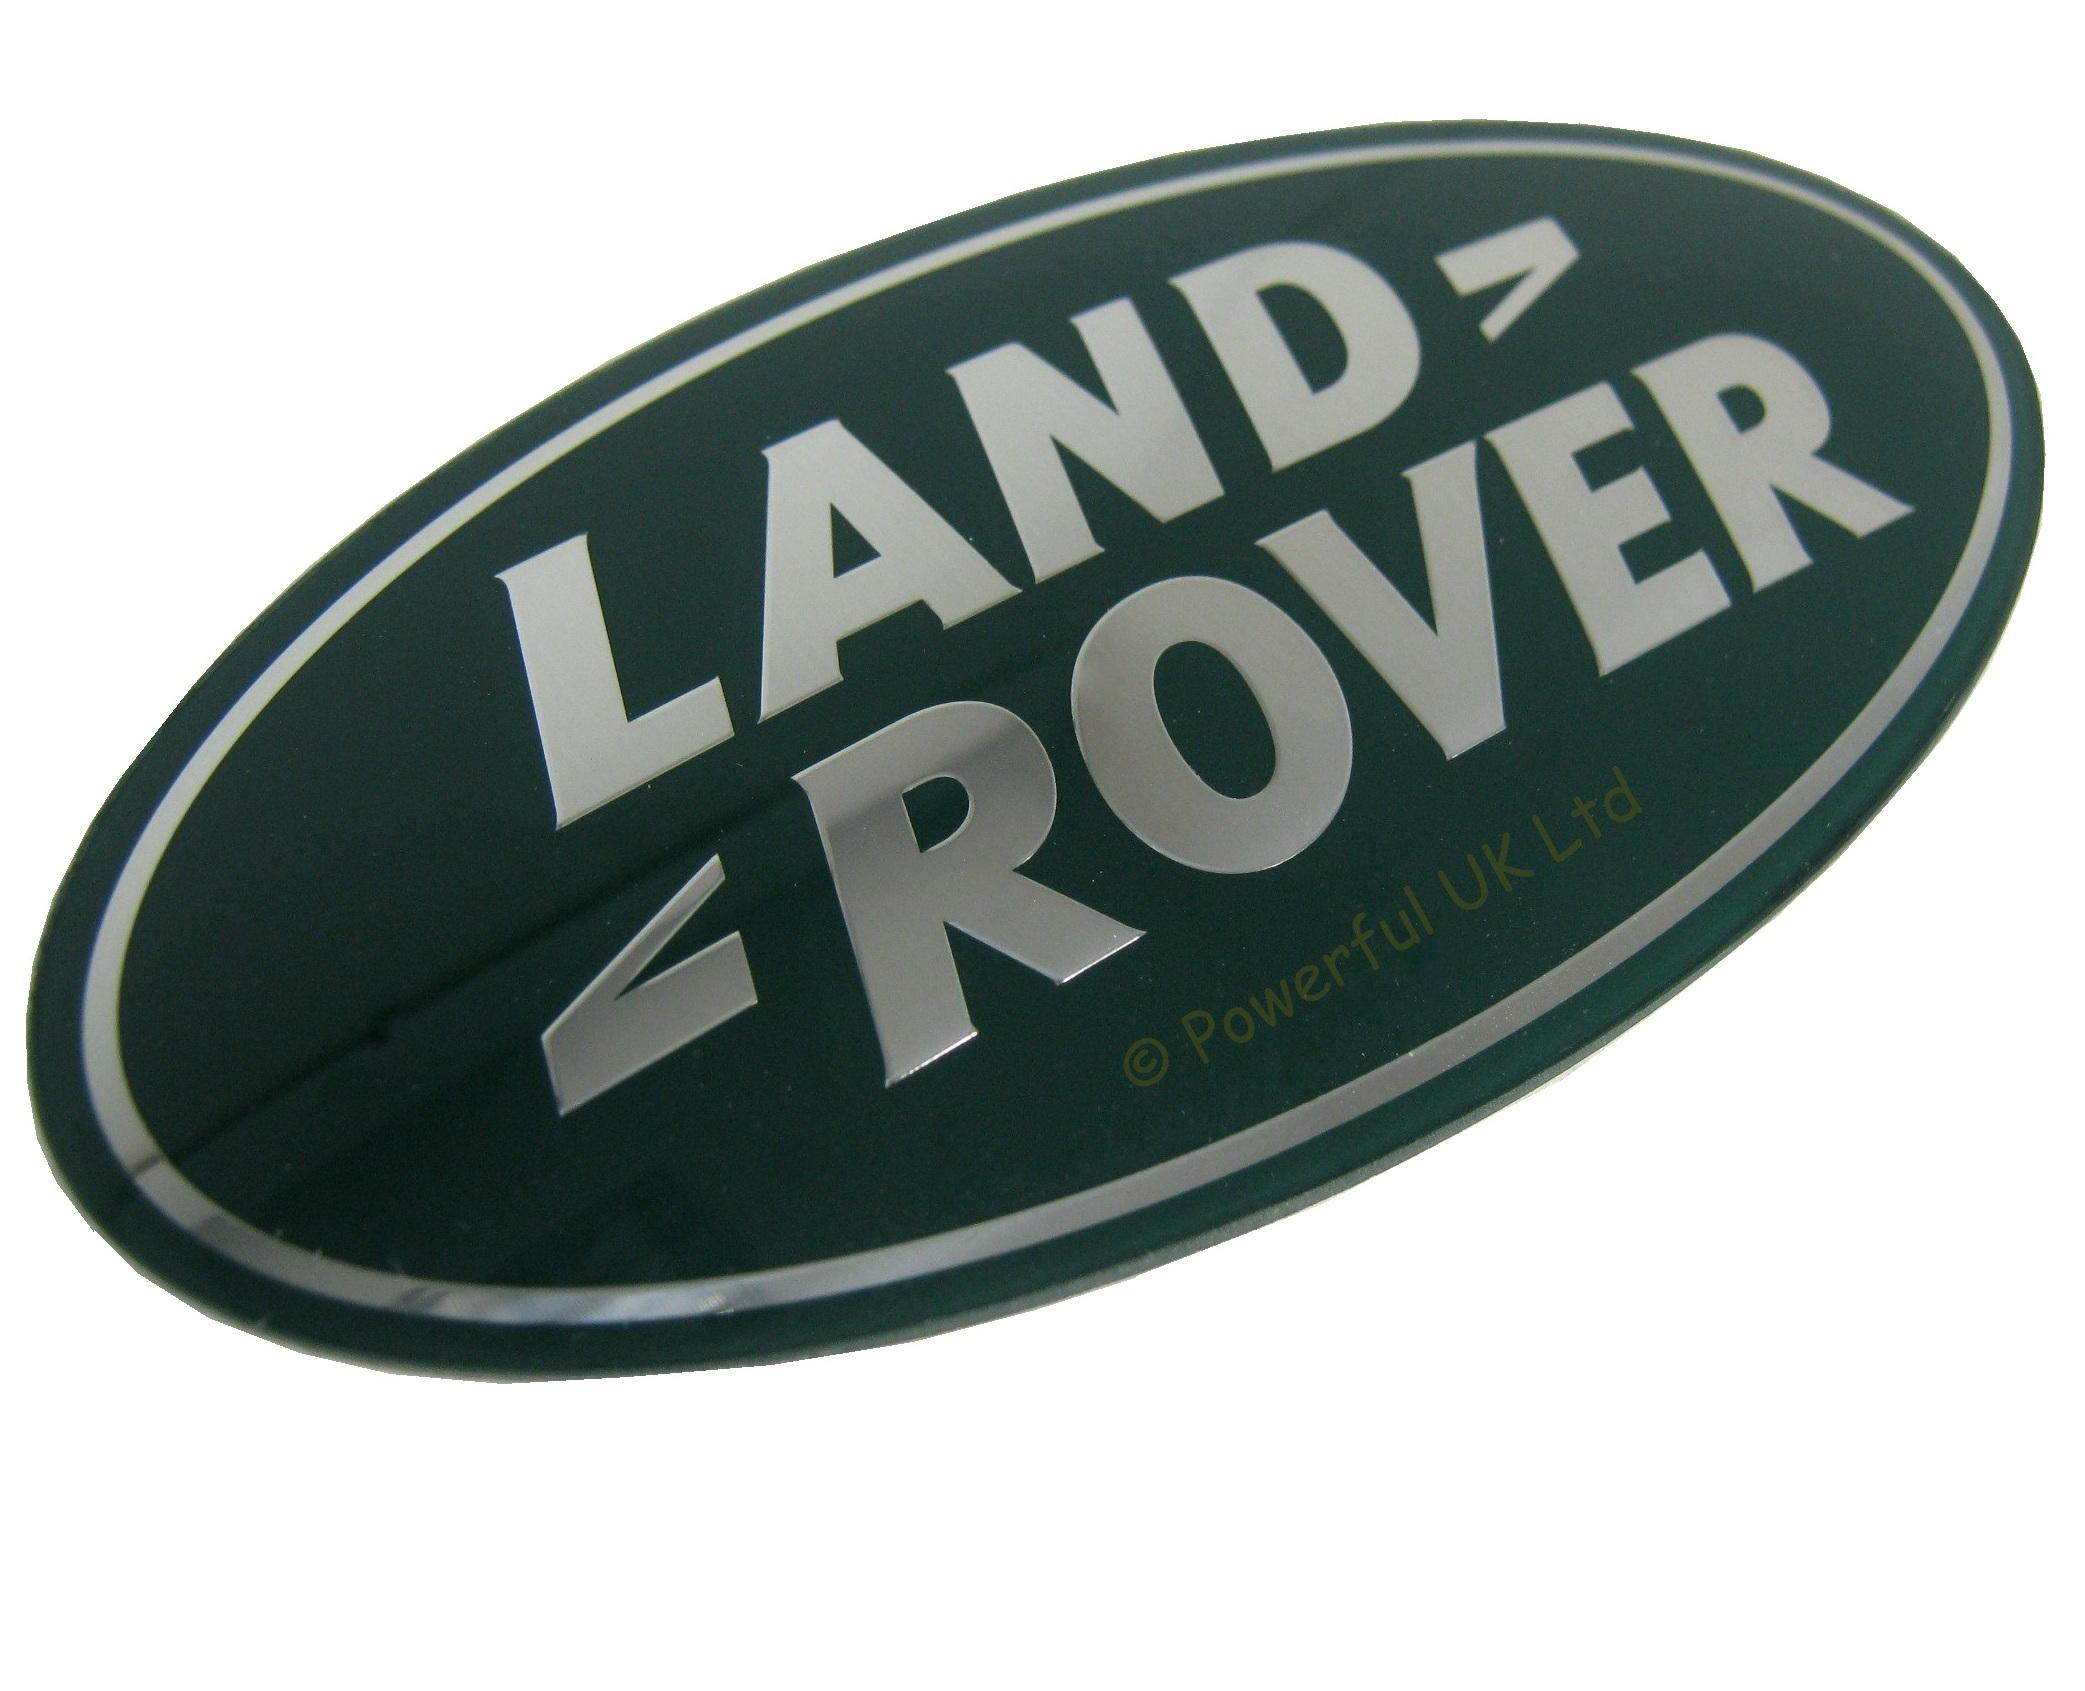 Genuine Land Rover Defender Grille Autocollant BTR1045